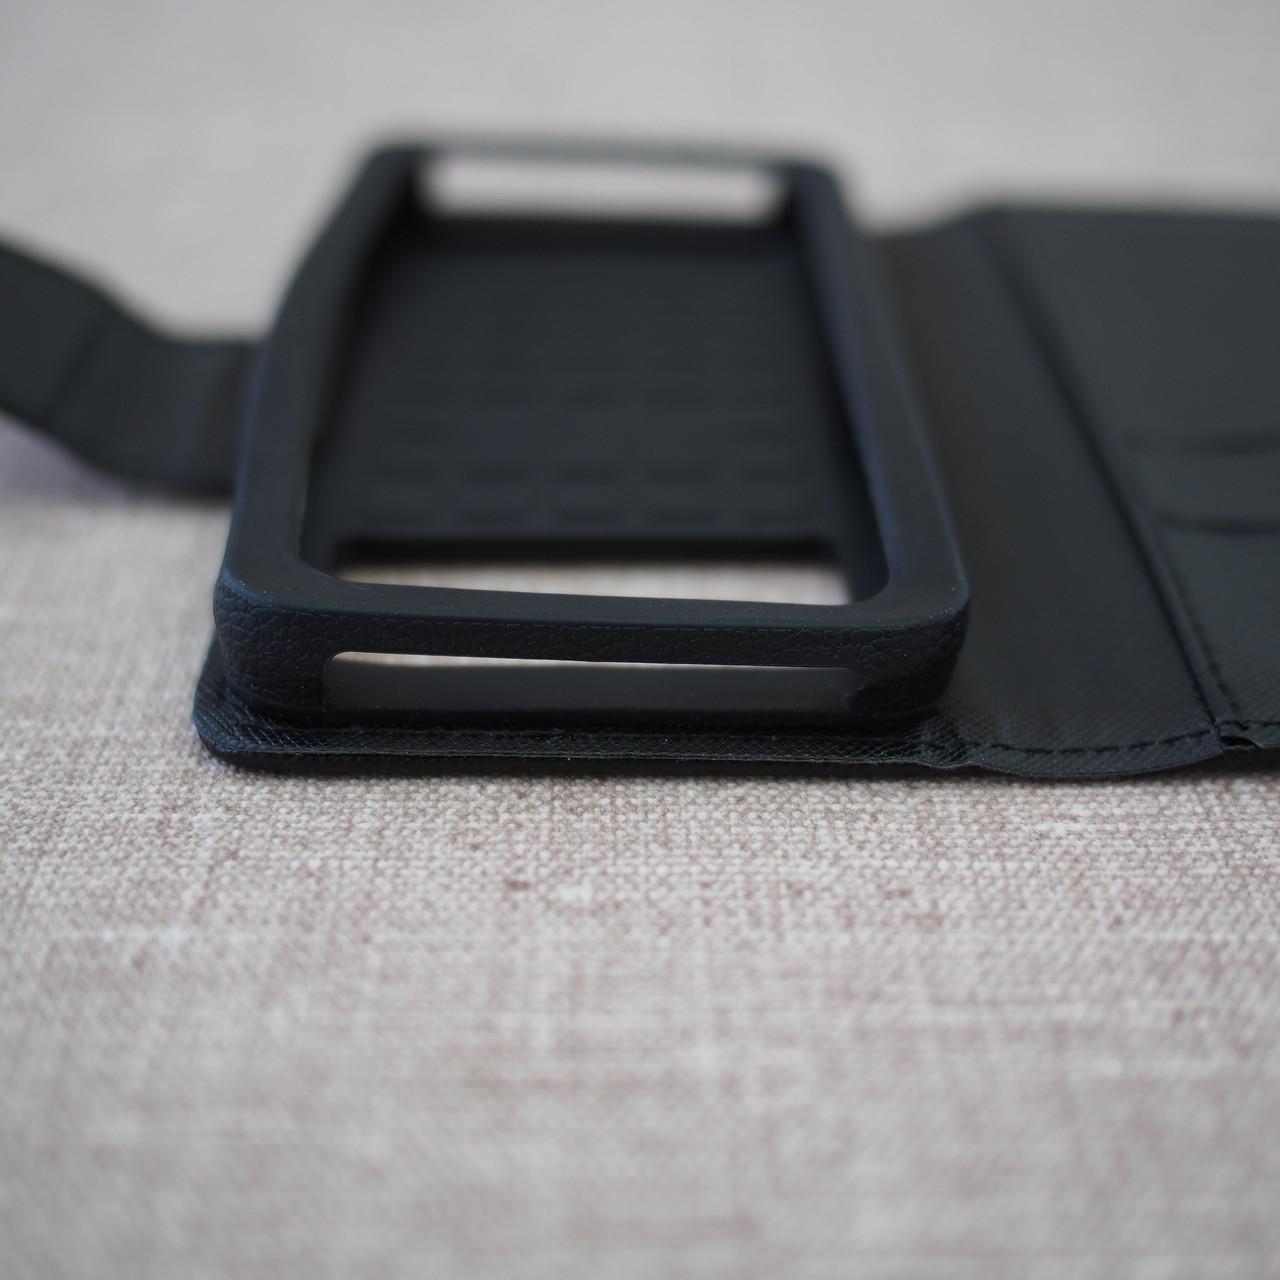 Чехол Goospery Fancy Diary Universal 4.3 black Для телефона Черный